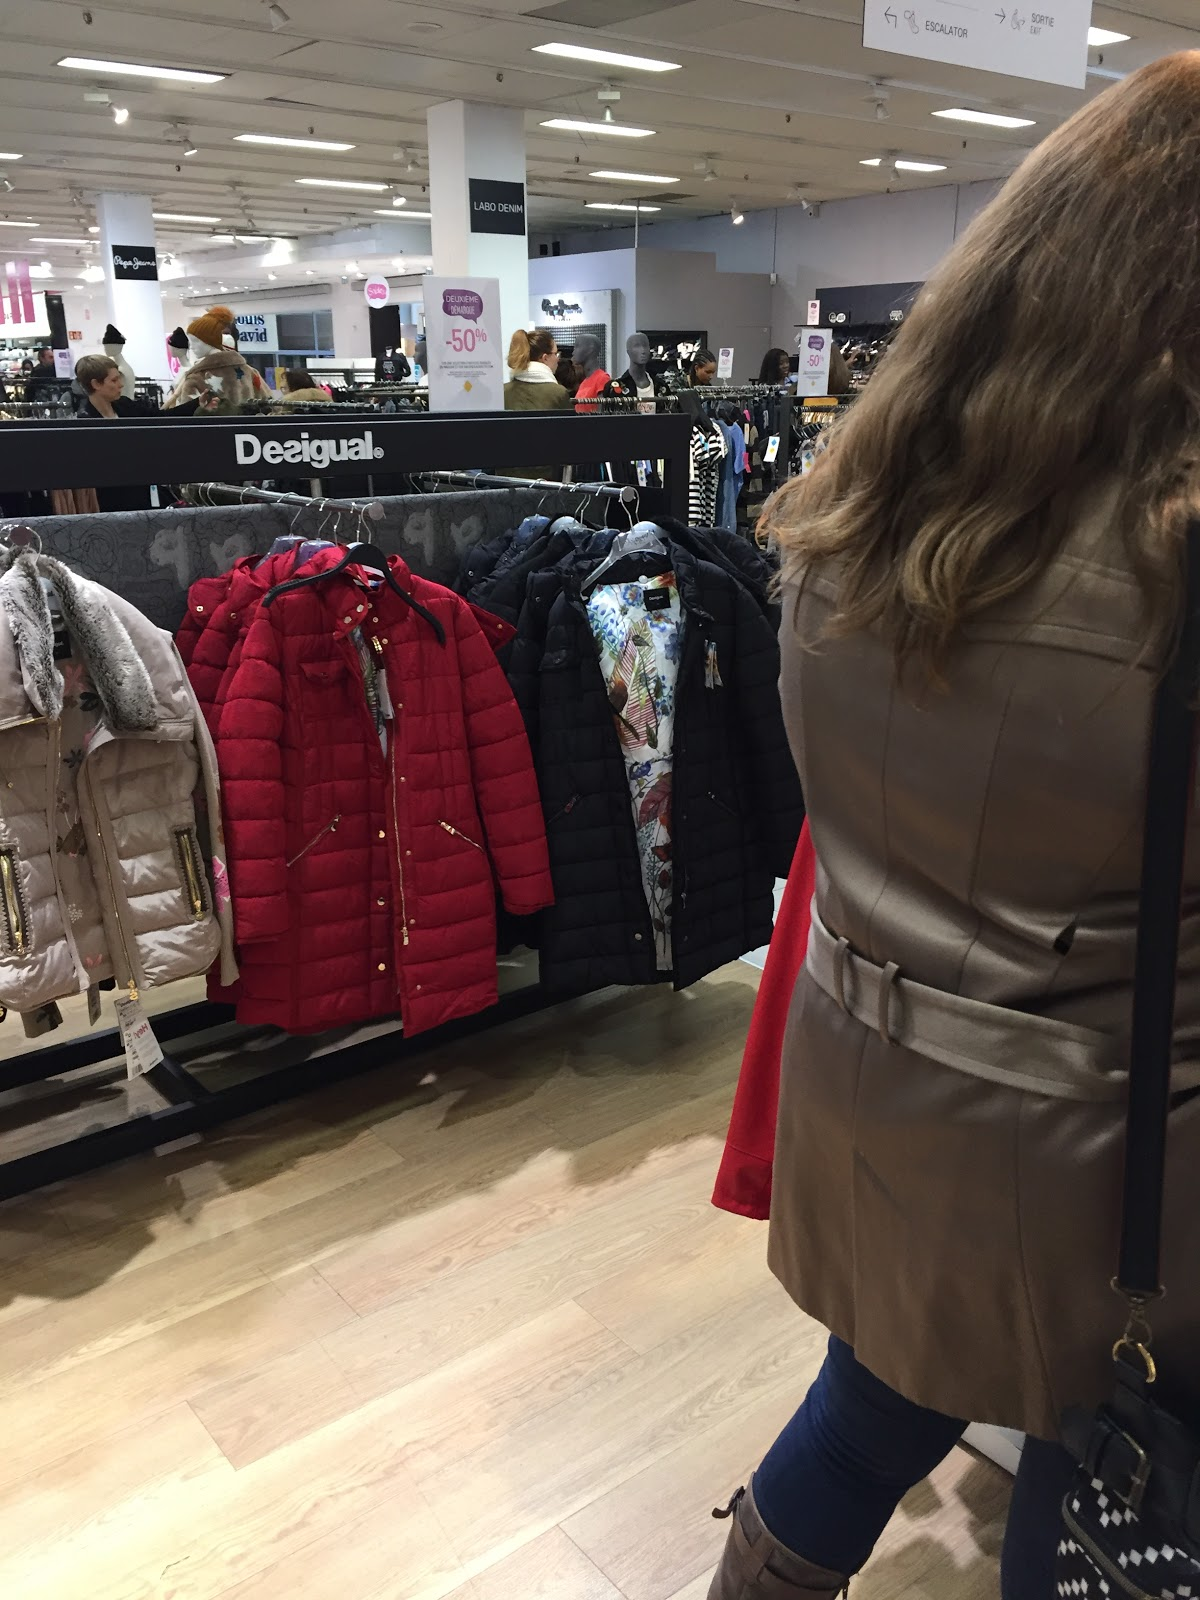 seance shopping galeries lafayette Rosny 2 les petites bulles de ma vie